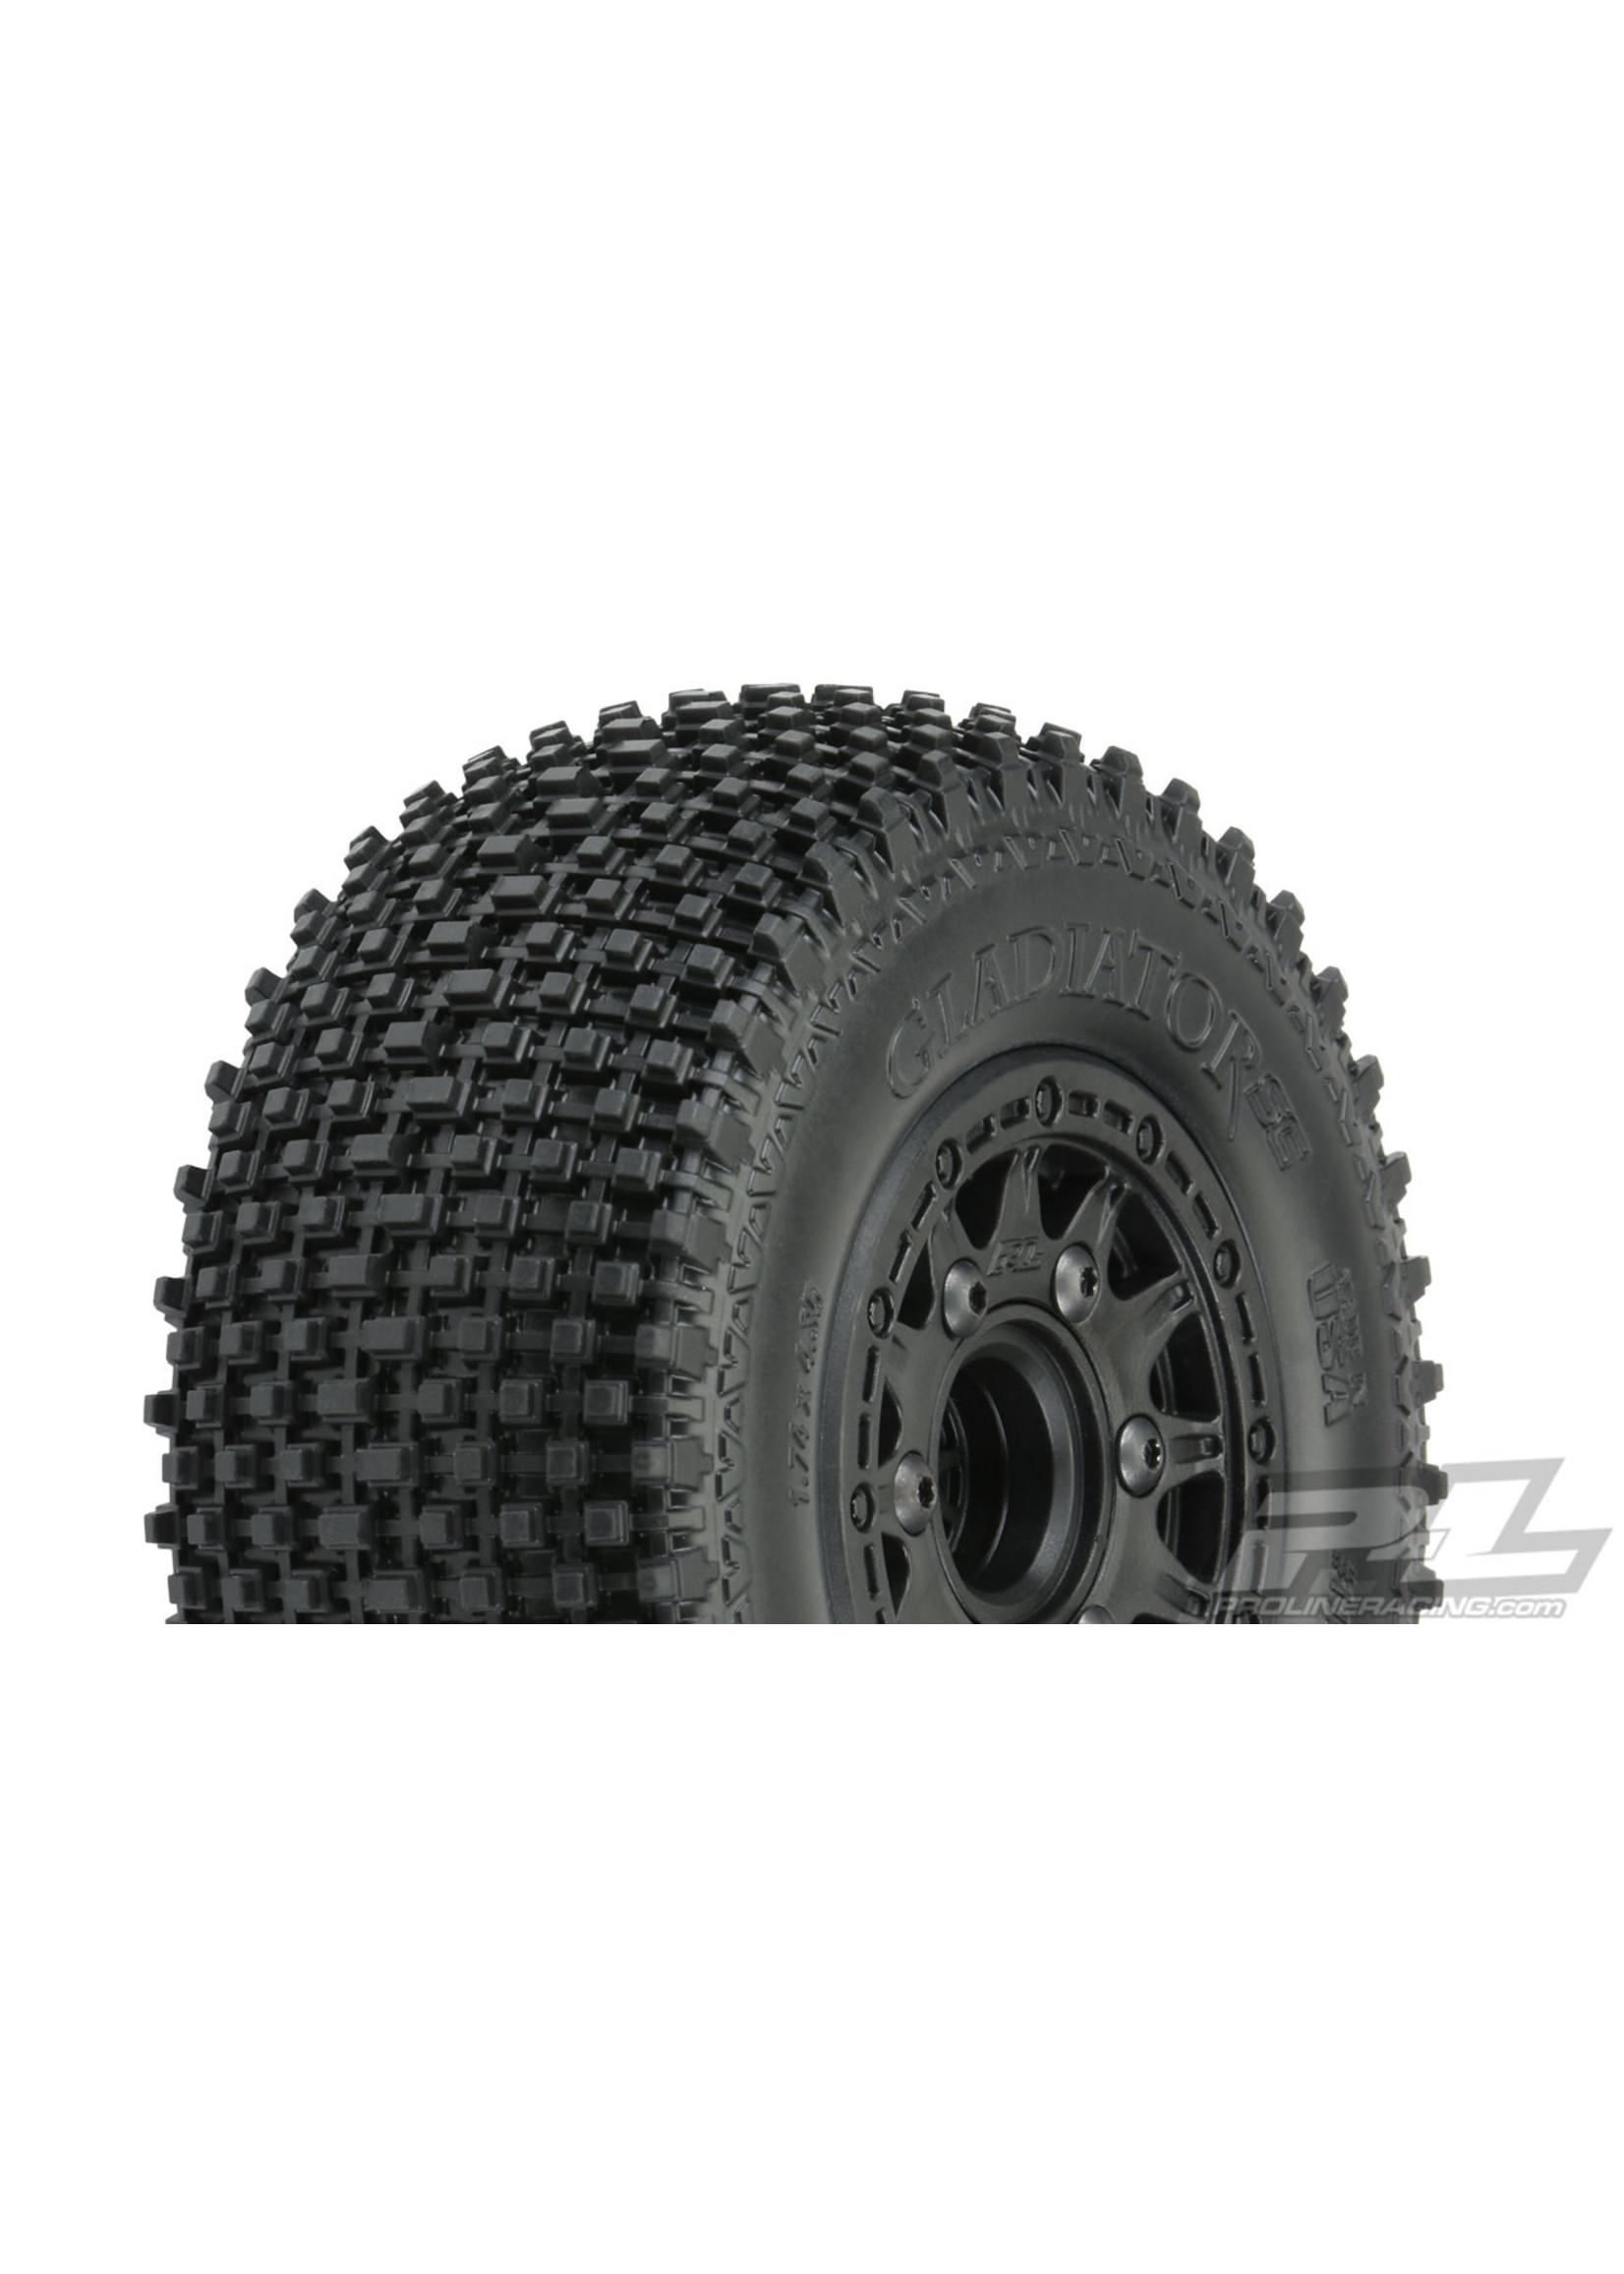 Pro-Line Racing PRO1169-10 Pro-Line Gladiator SC M2 MTD Raid Slash 2wd/4WD F/R